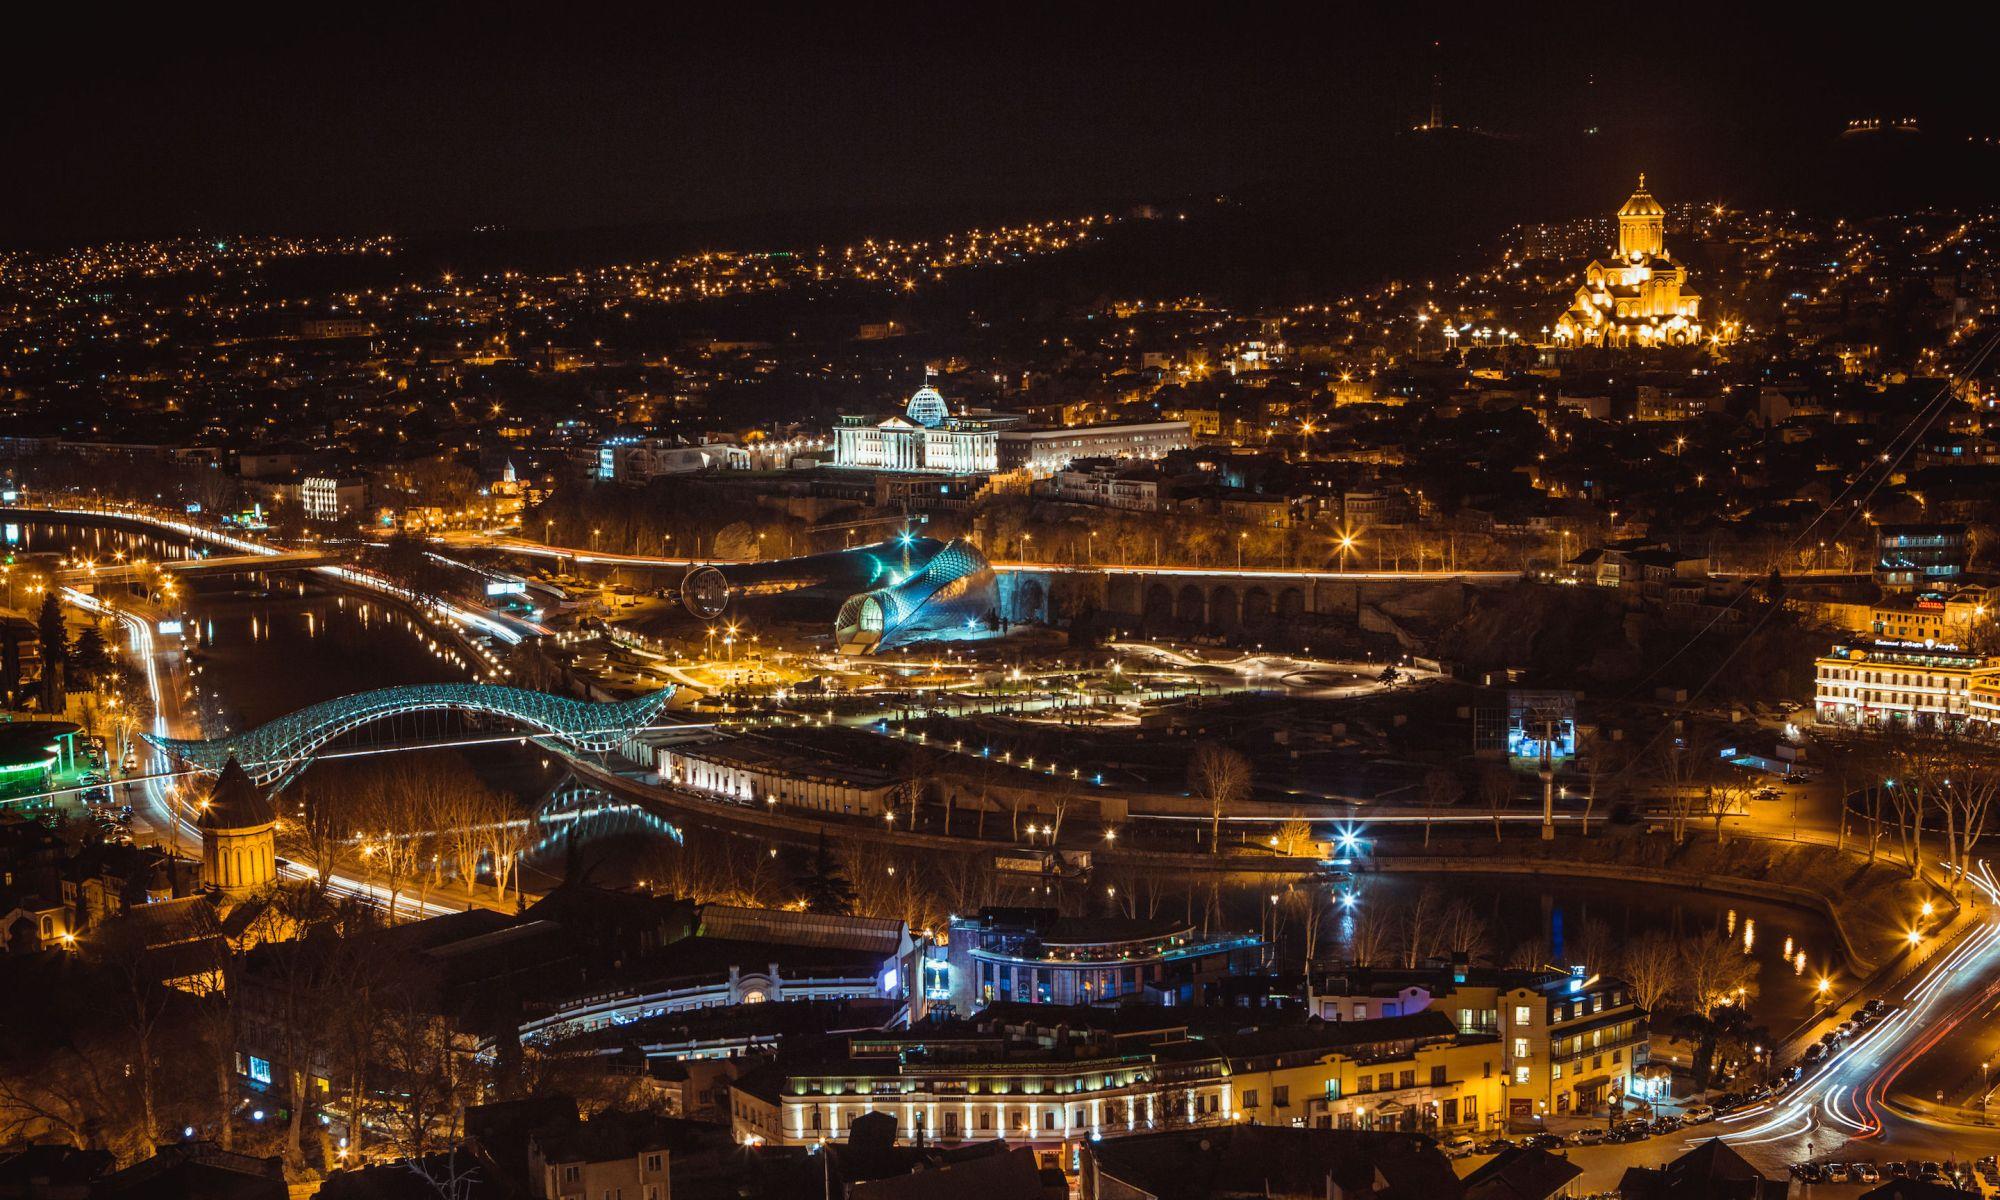 Tbilisi panorama at night